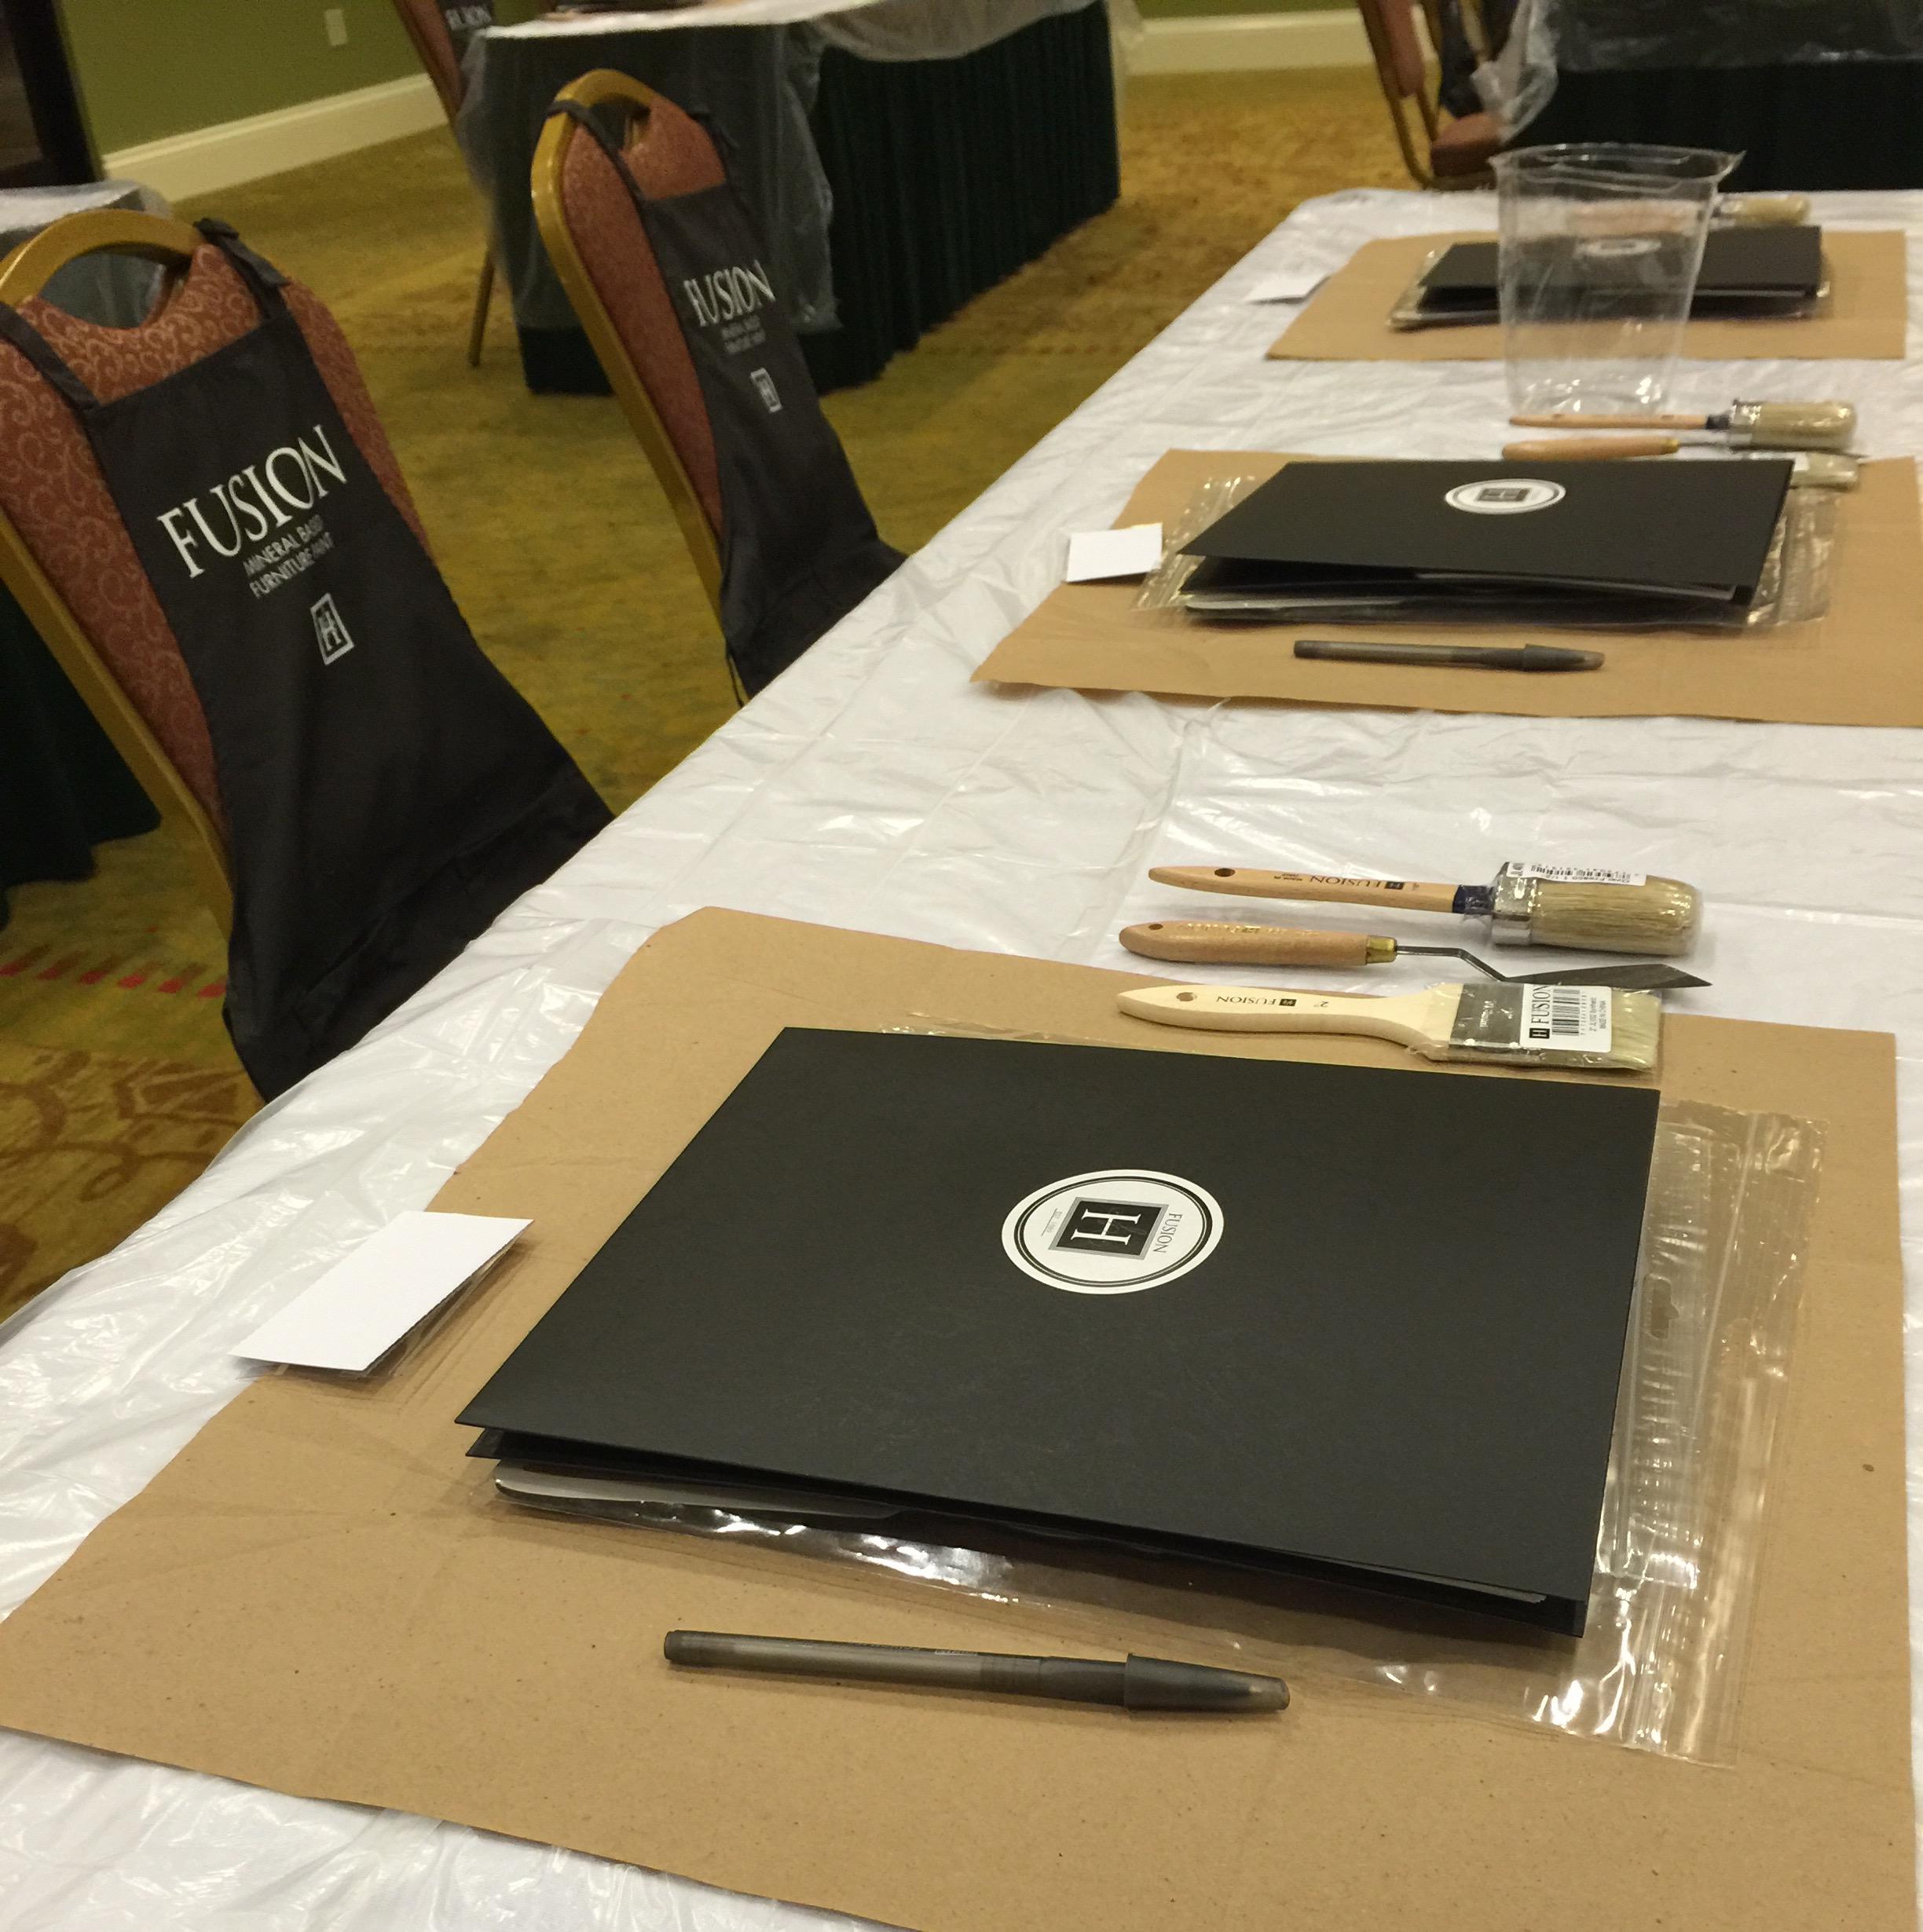 Orlando Fusion Summit & Retreat! 8